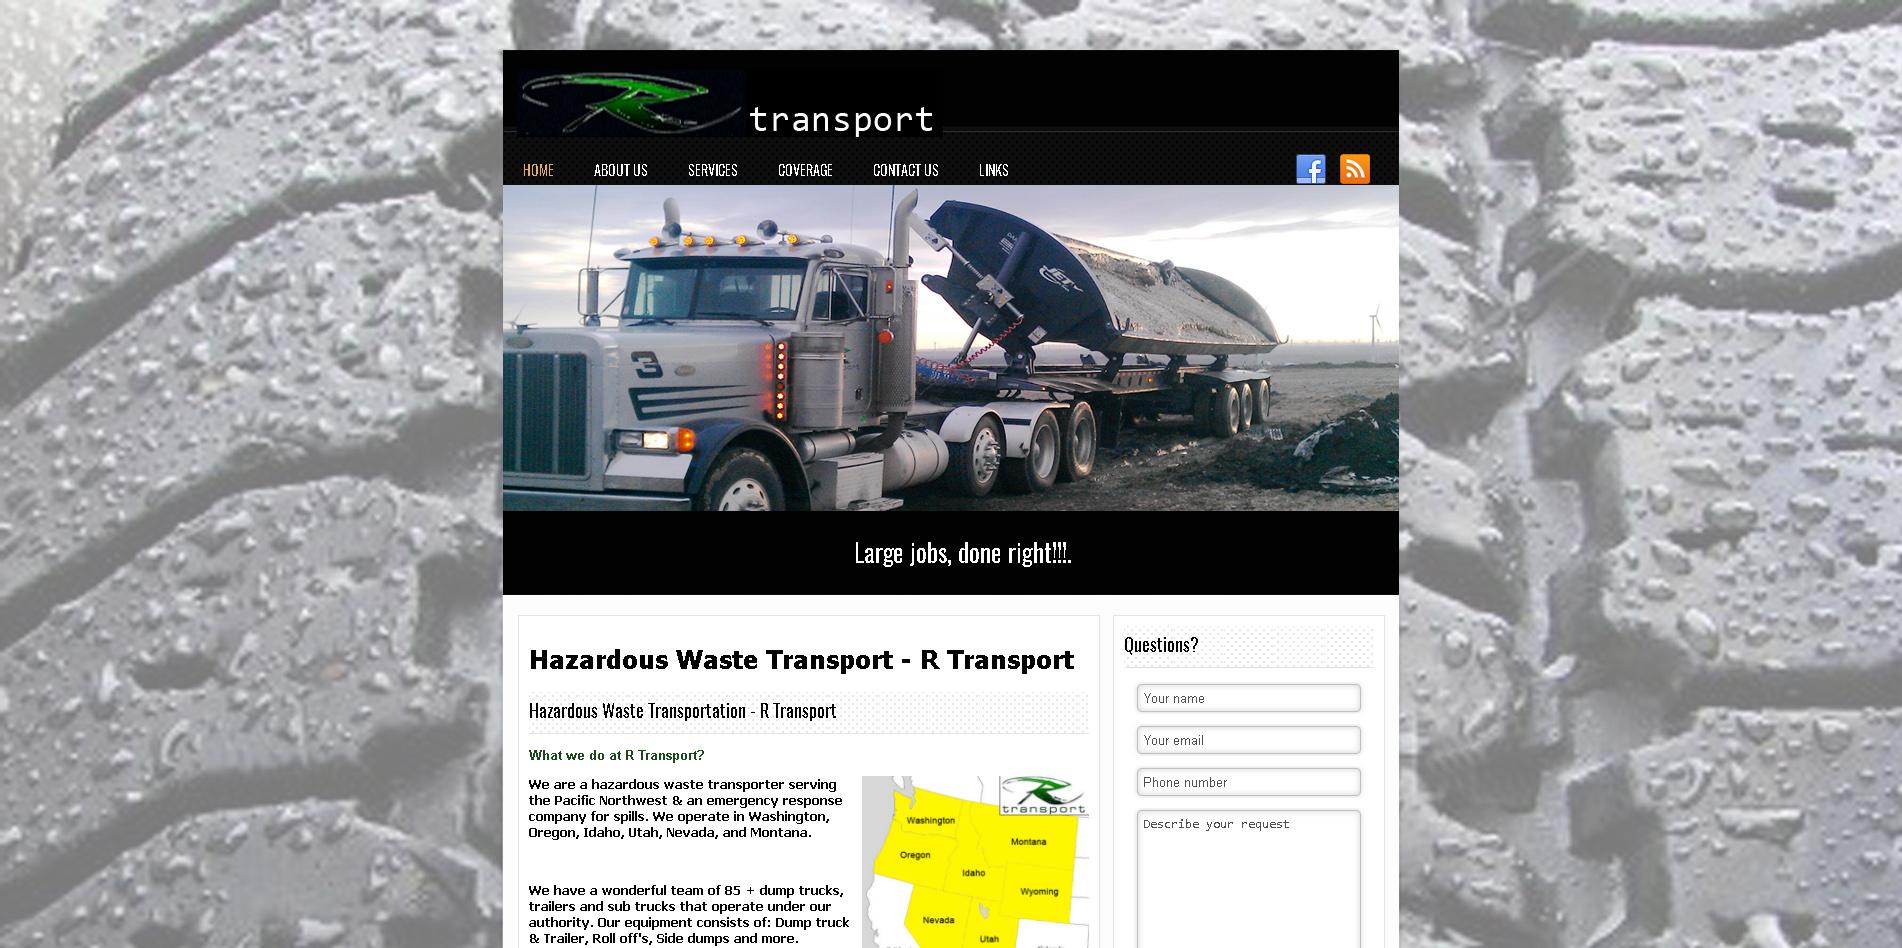 R Transport